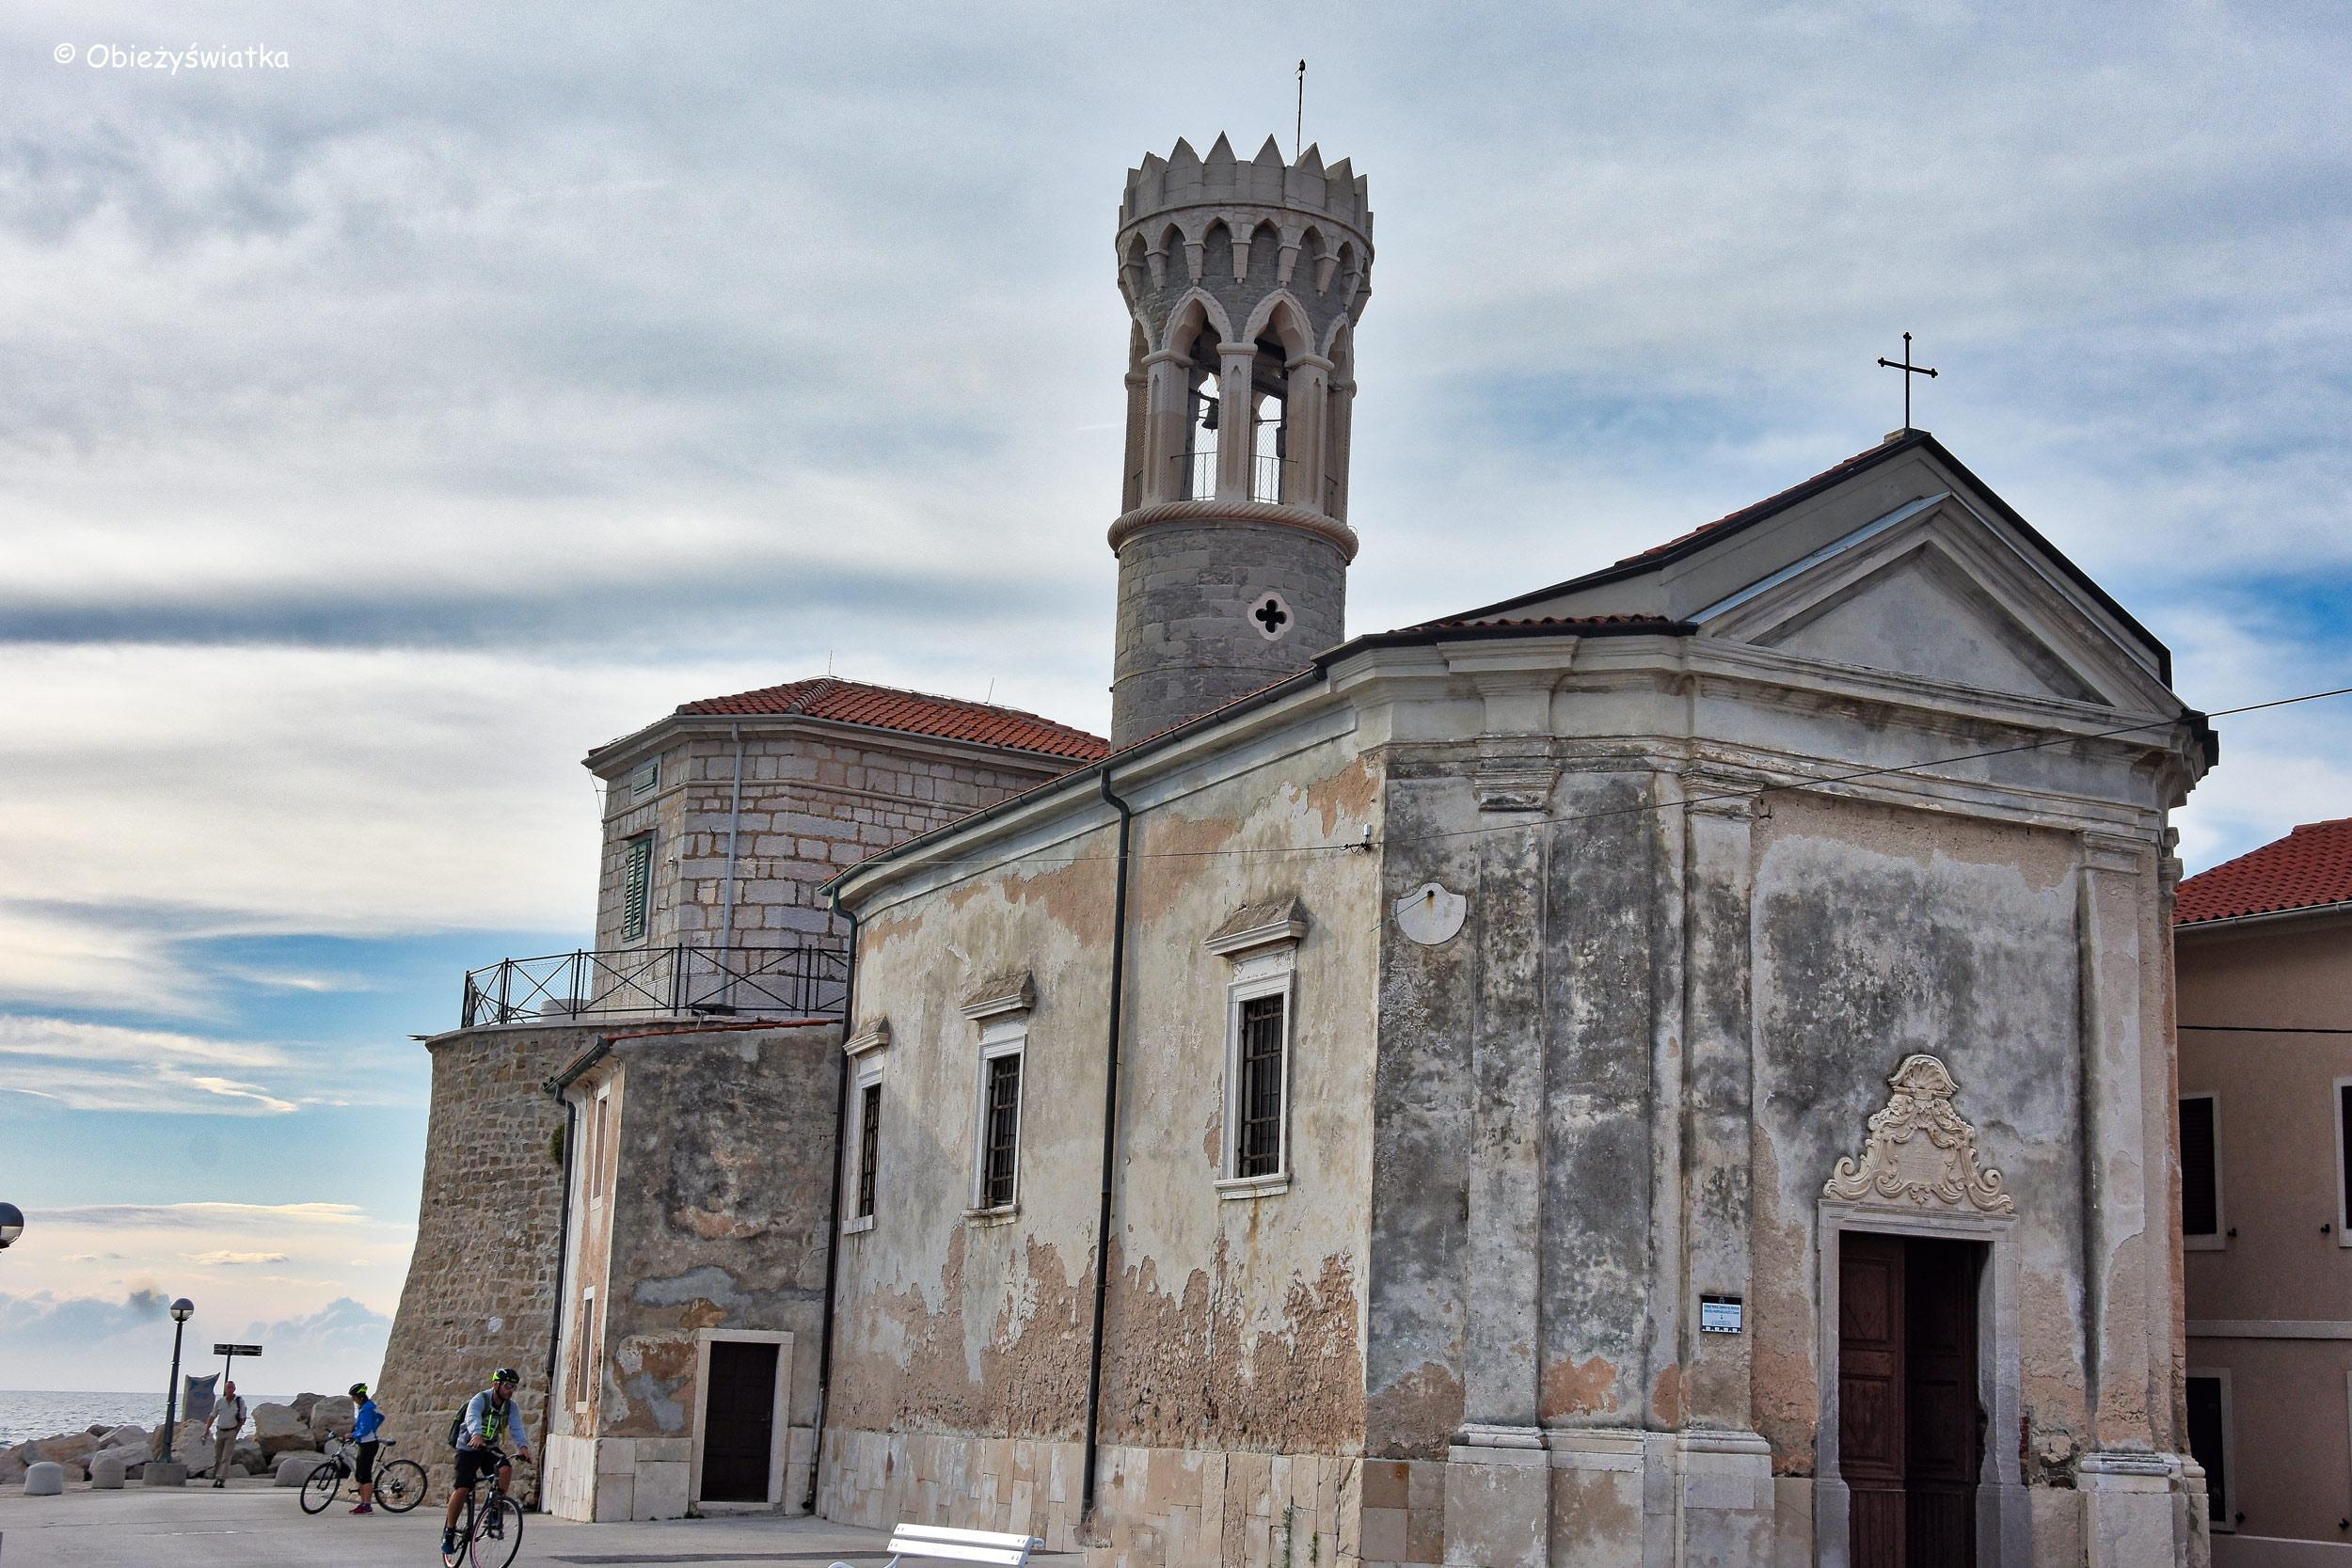 Kościółek Madonna della Salute w Piranie, Słowenia